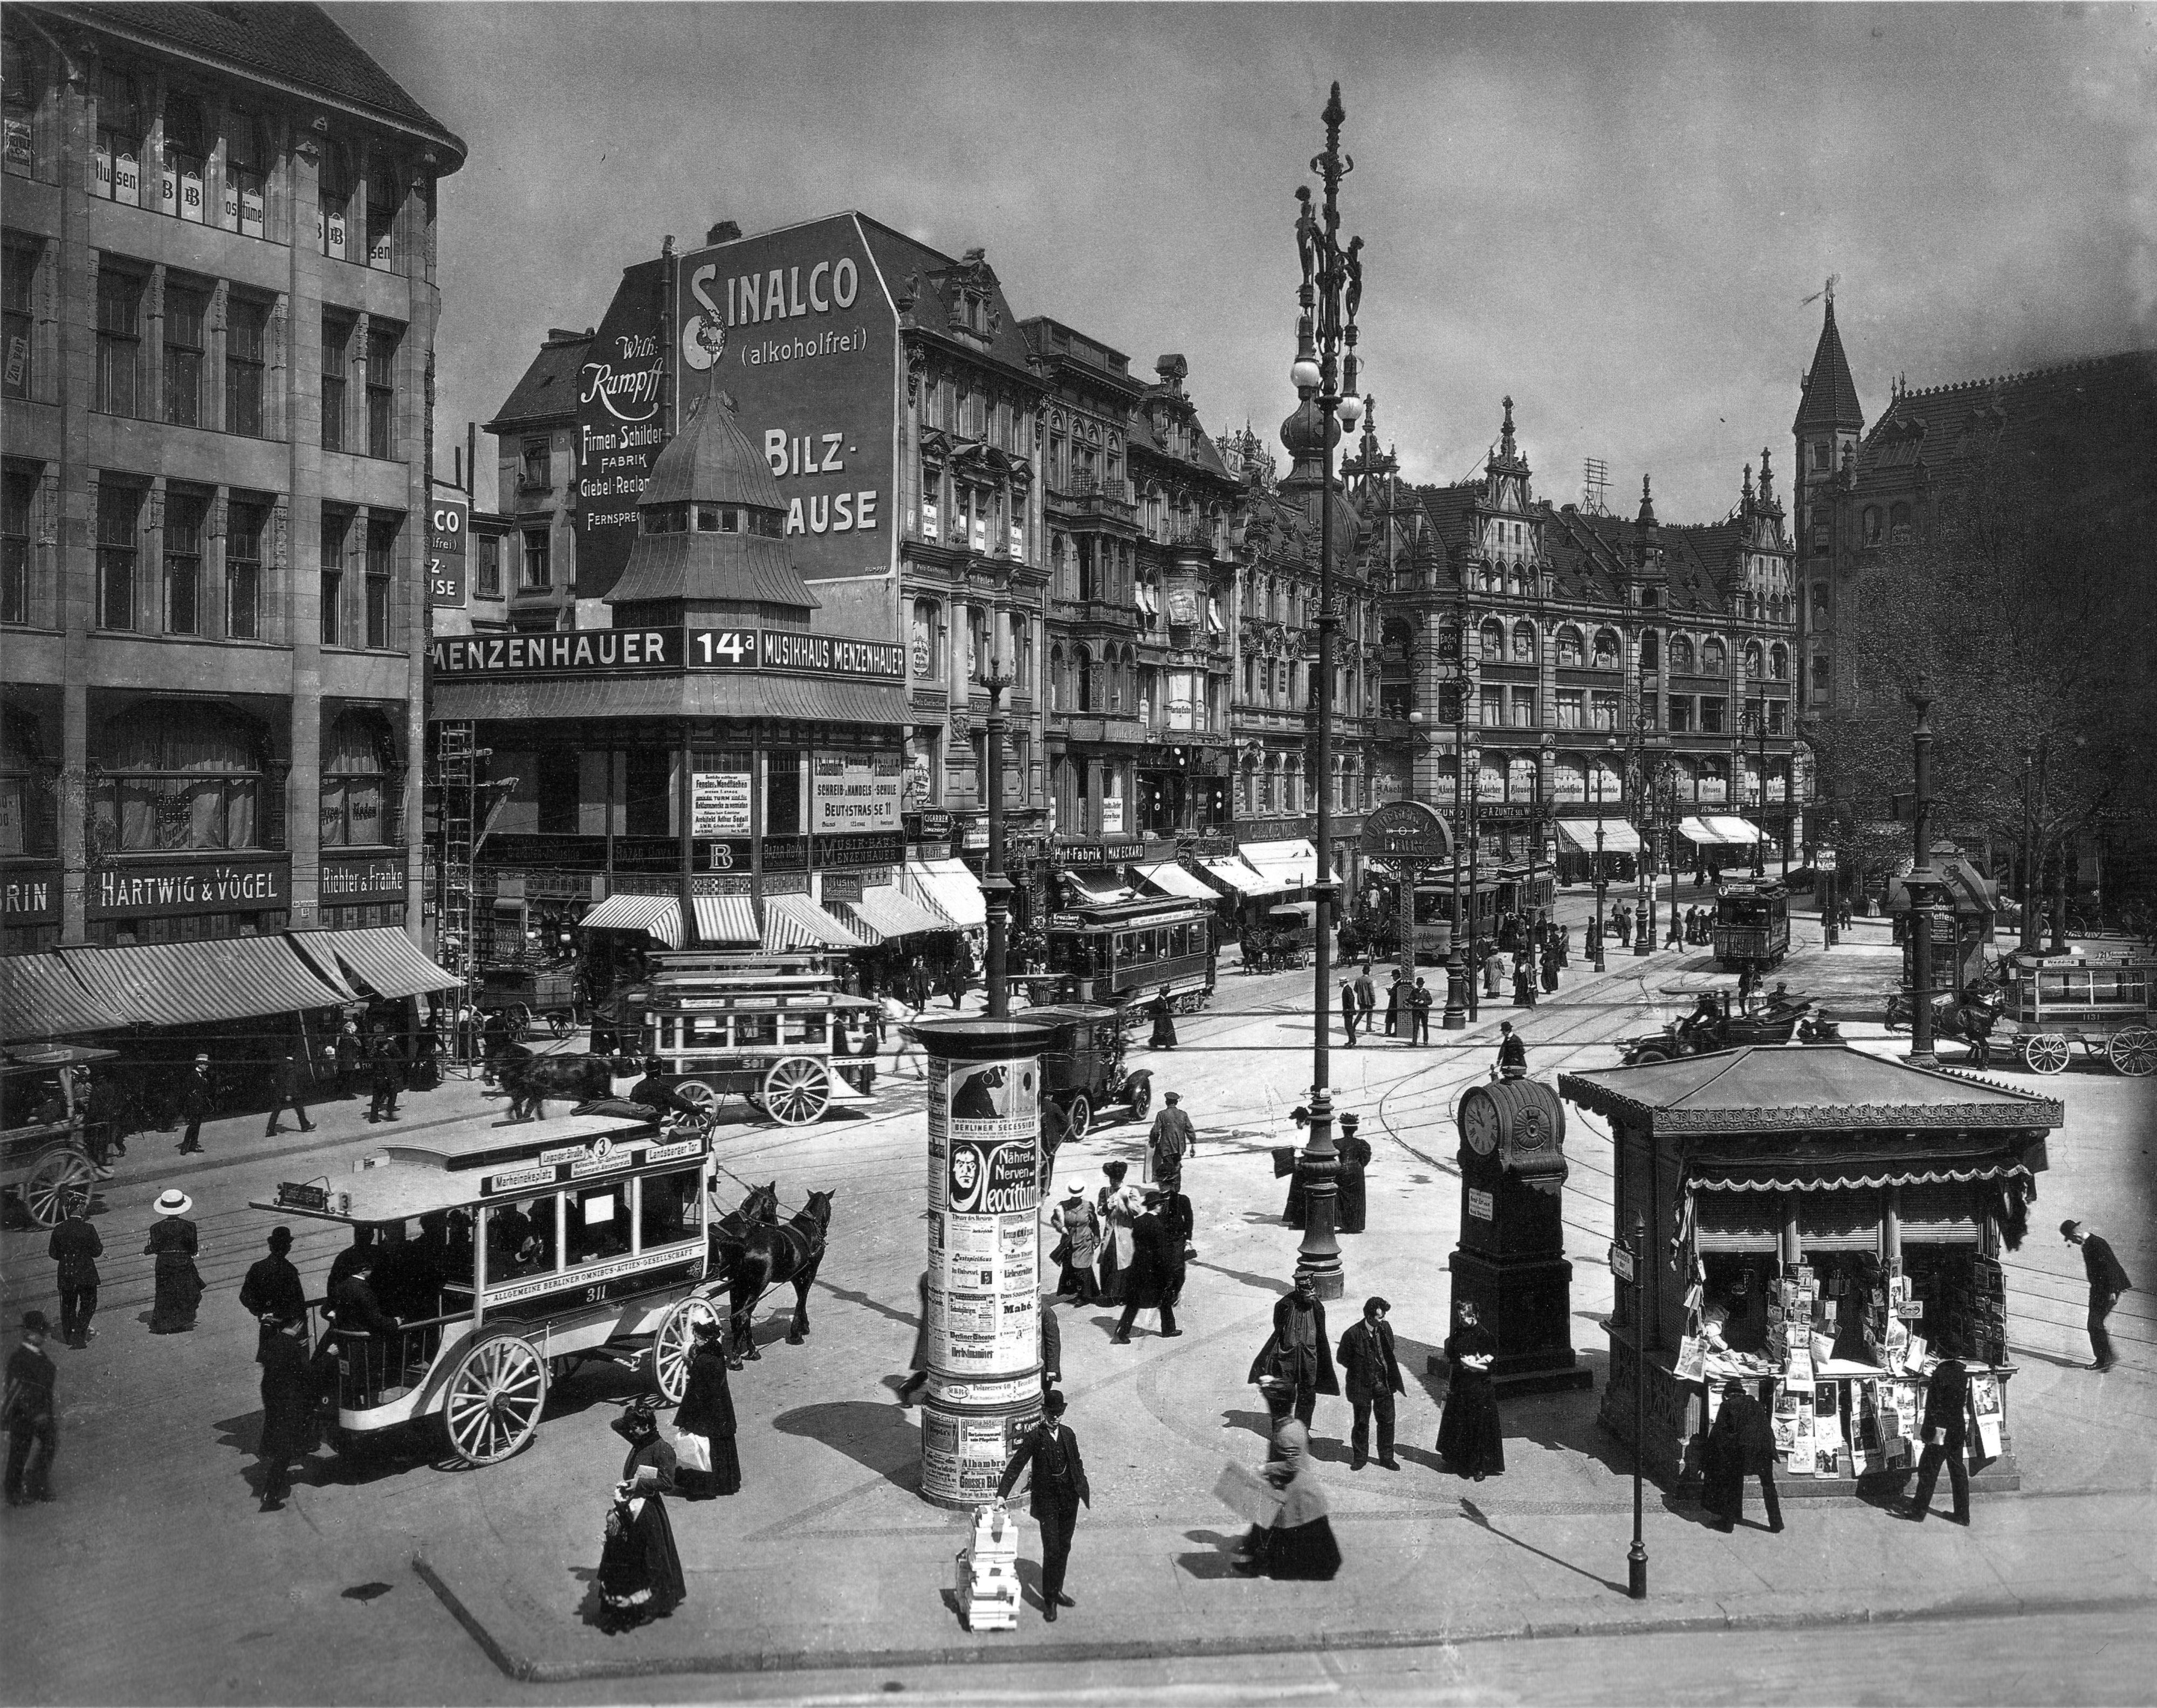 perierga.gr - To Βερολίνο του 1896 σε ένα βίντεο!